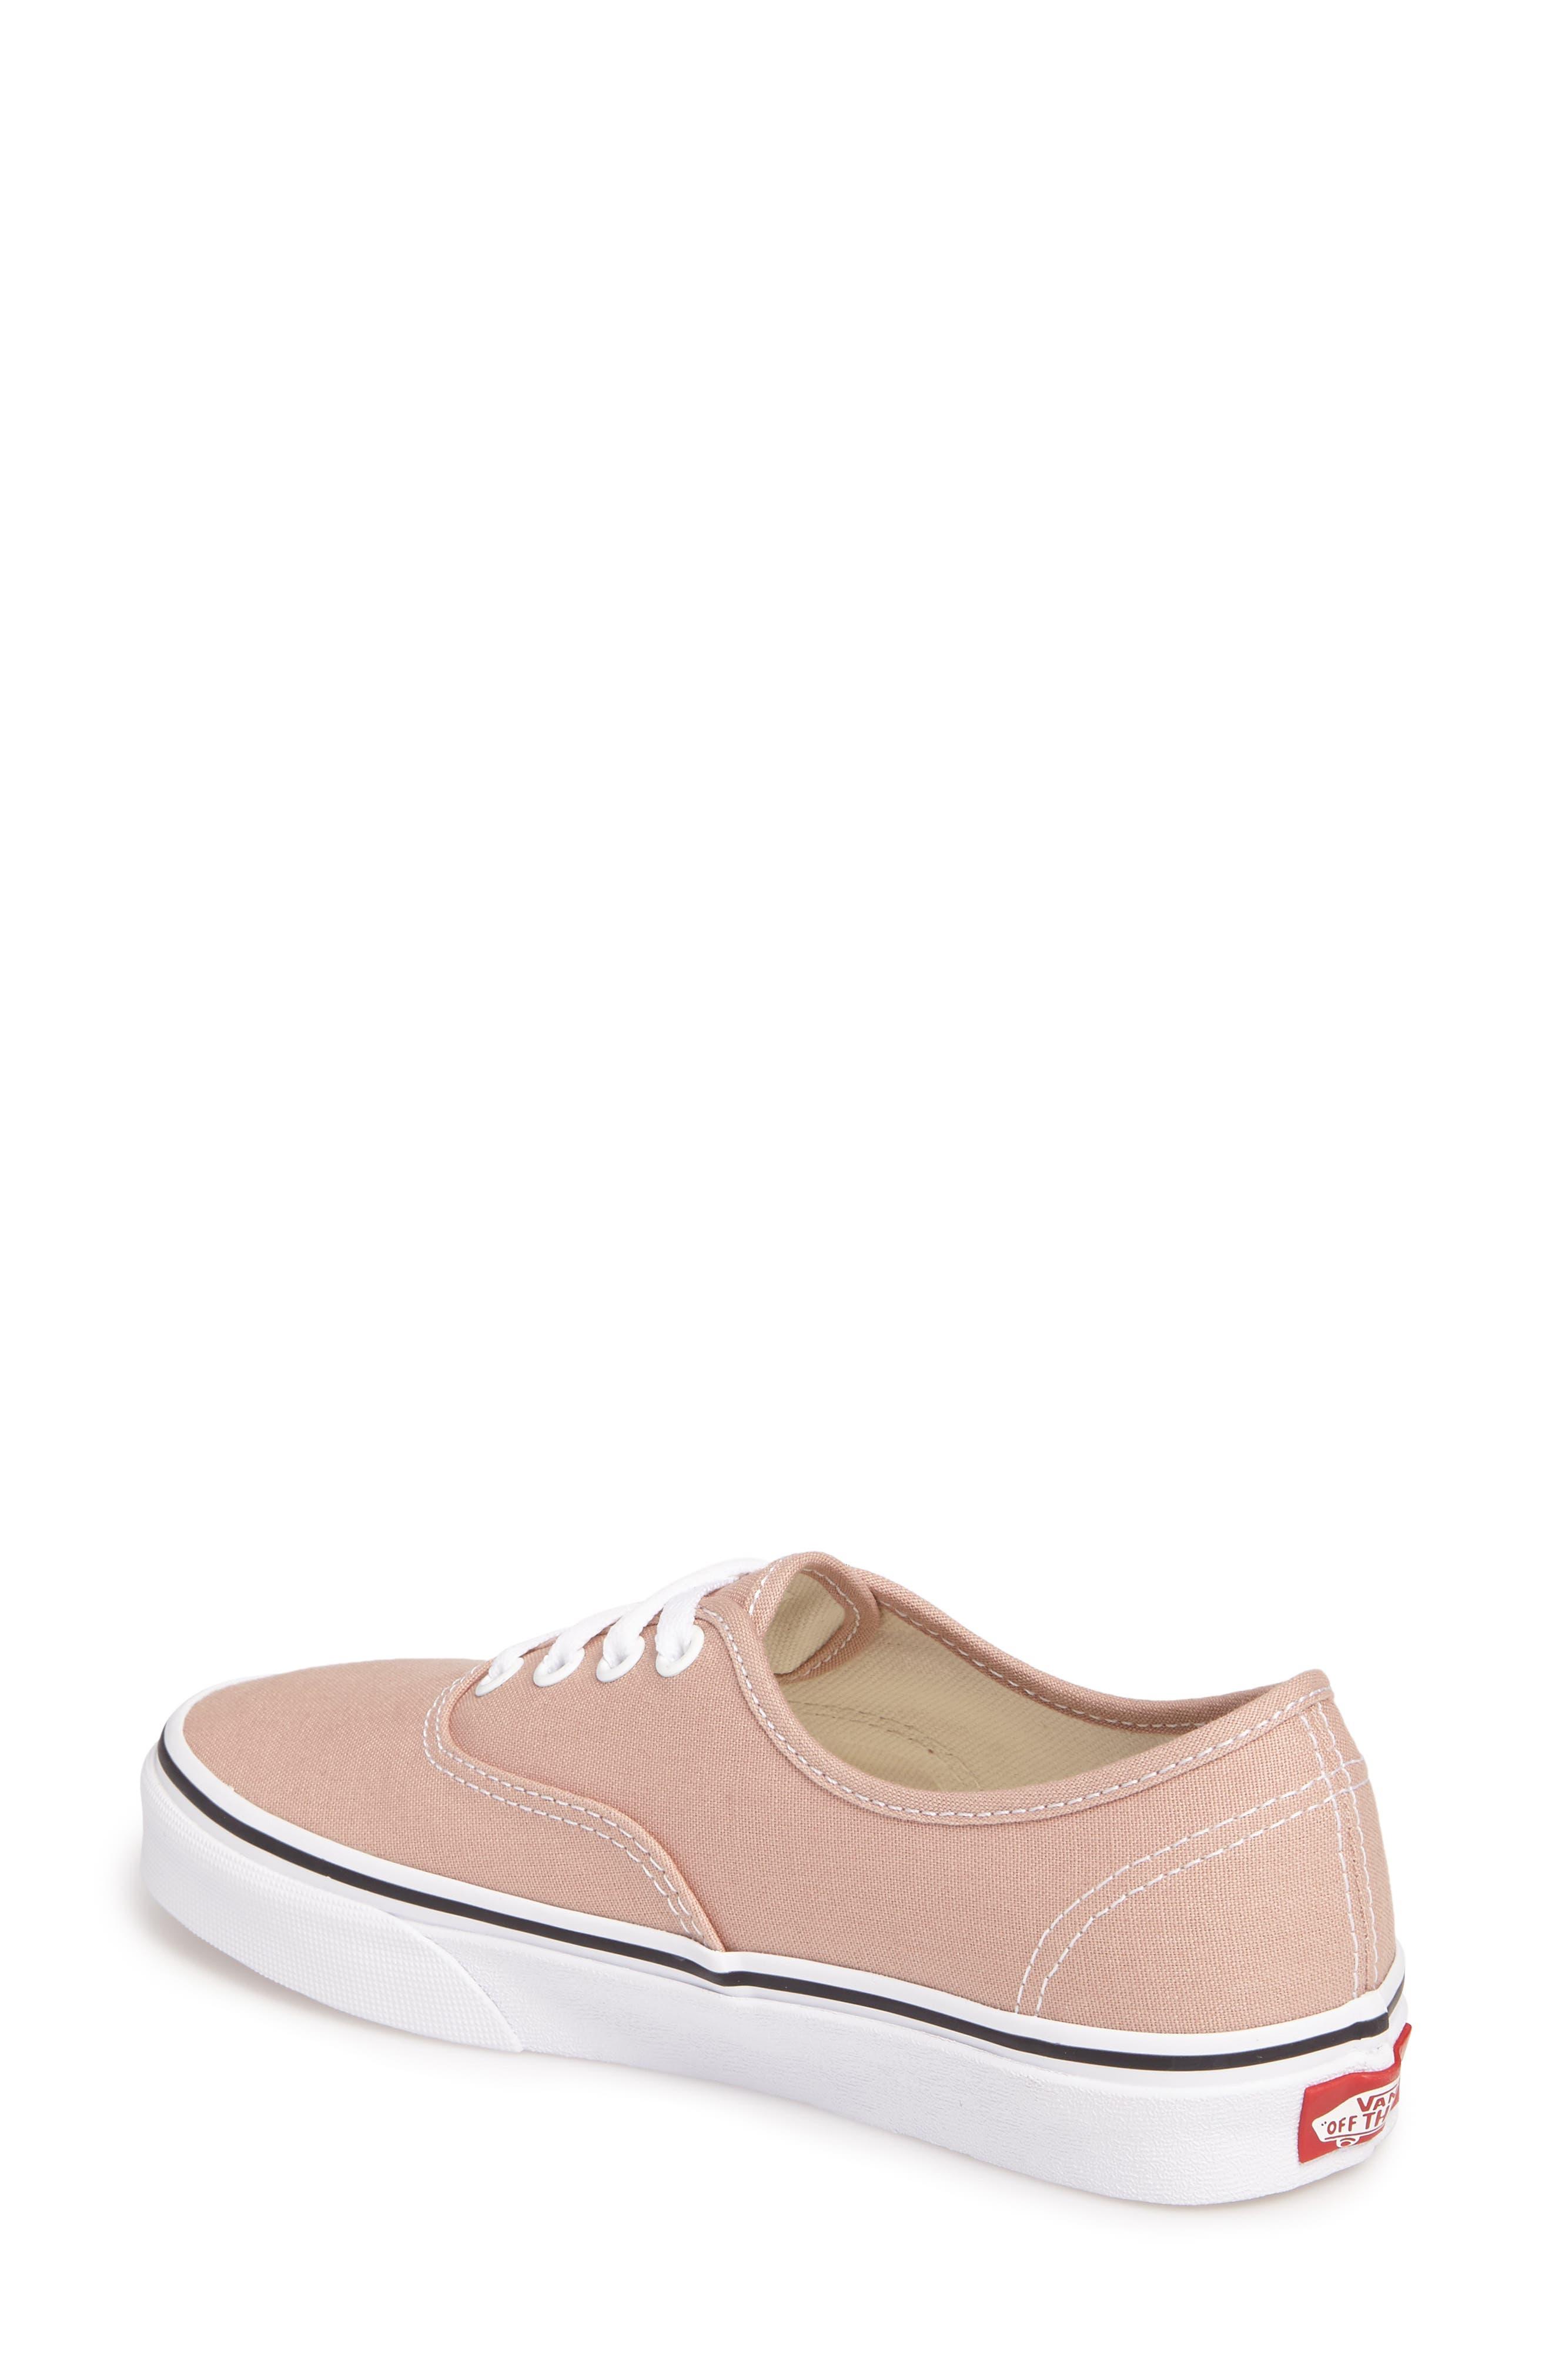 ,                             'Authentic' Sneaker,                             Alternate thumbnail 422, color,                             654